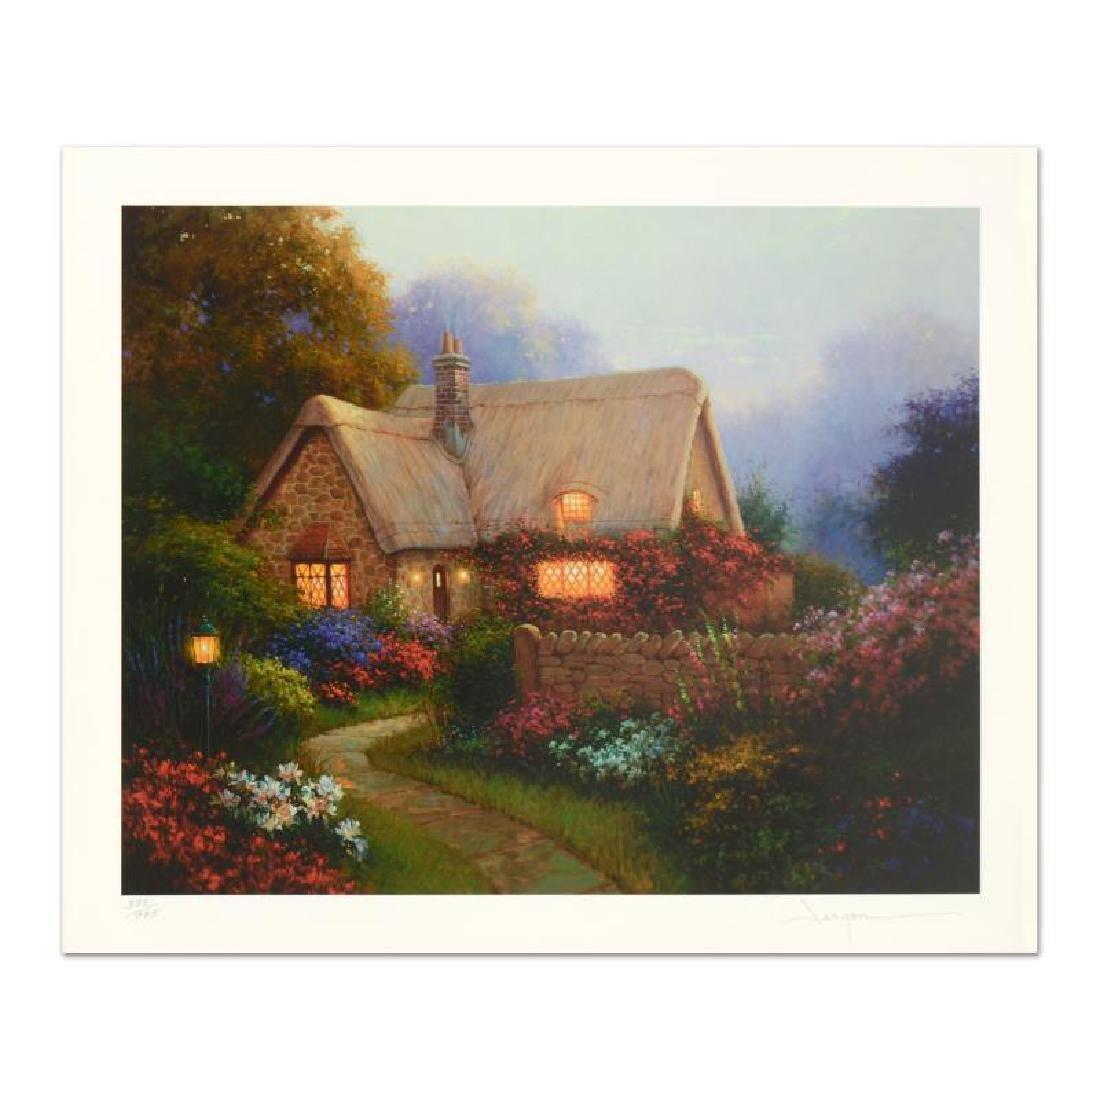 Bougainvillea Cottage by Sergon